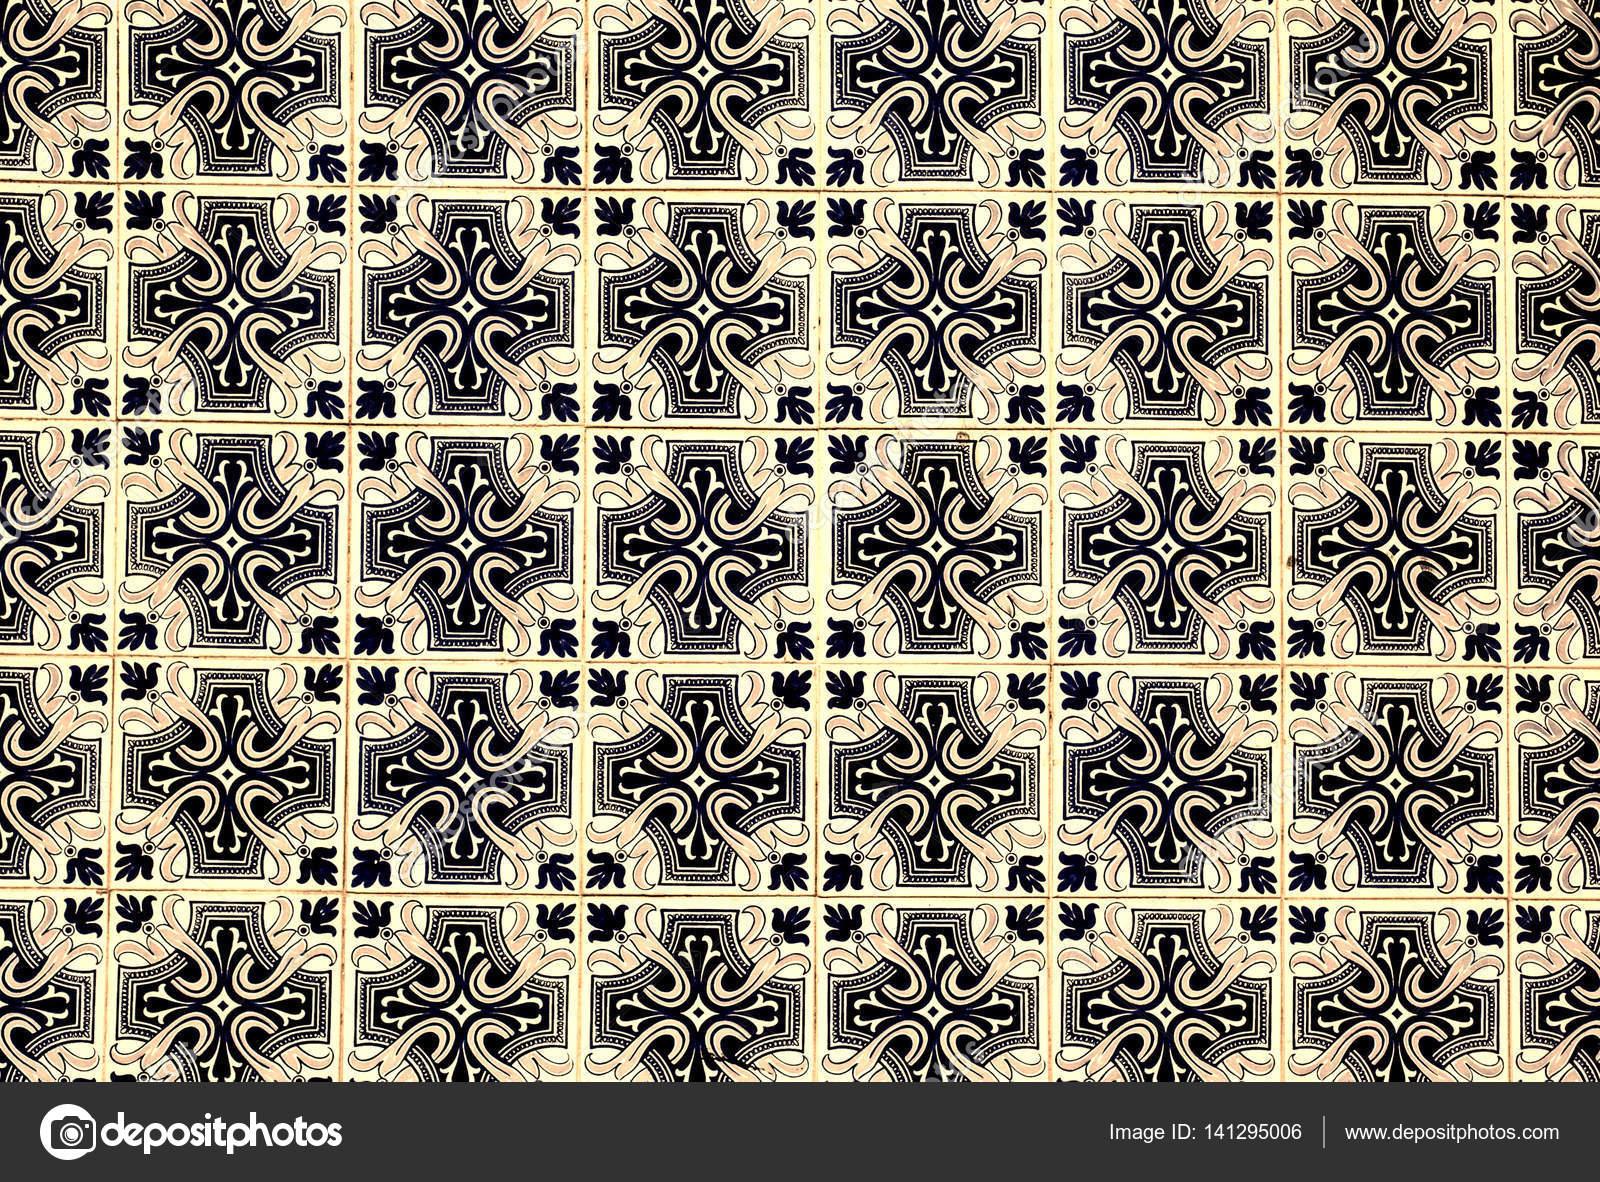 Portugese Tegels Outlet : Afbeeldingen marokkaanse tegels archidev